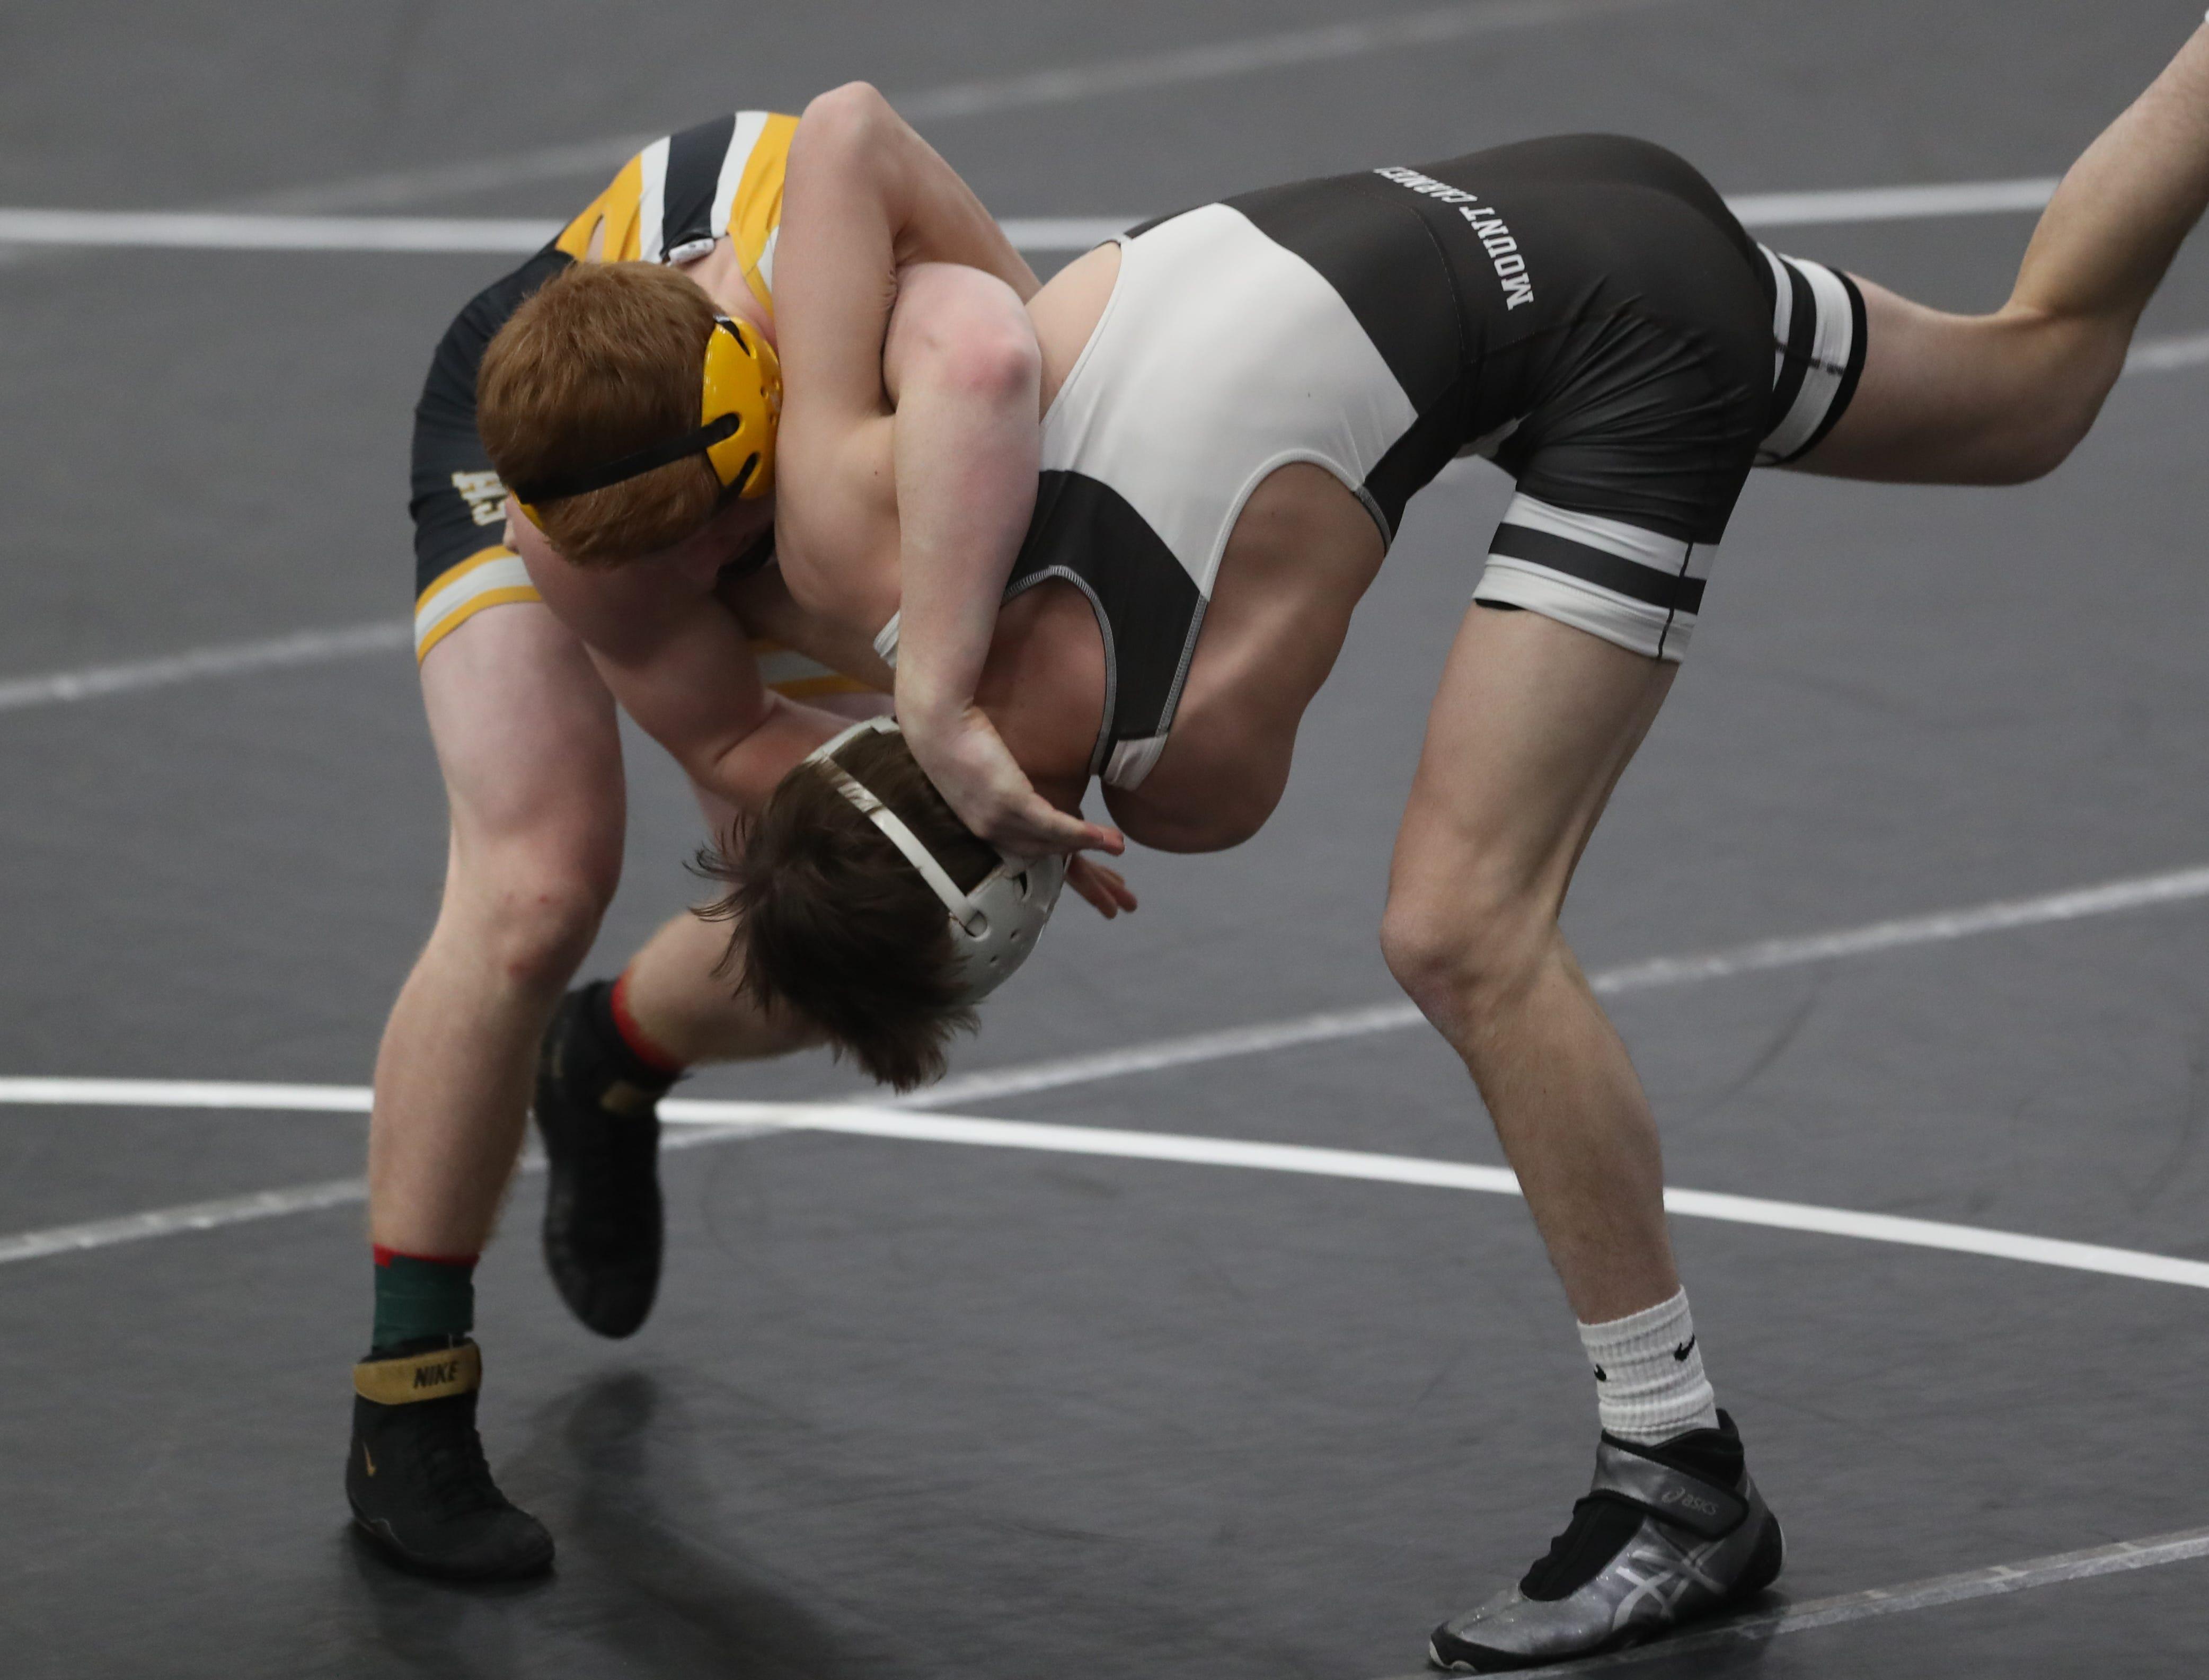 Ryan Strickland, of Southeast Polk High, wrestles at the Cheesehead Invitational at Kaukauna High School in Kaukauna, Wisconsin, on Jan. 5, 2019.